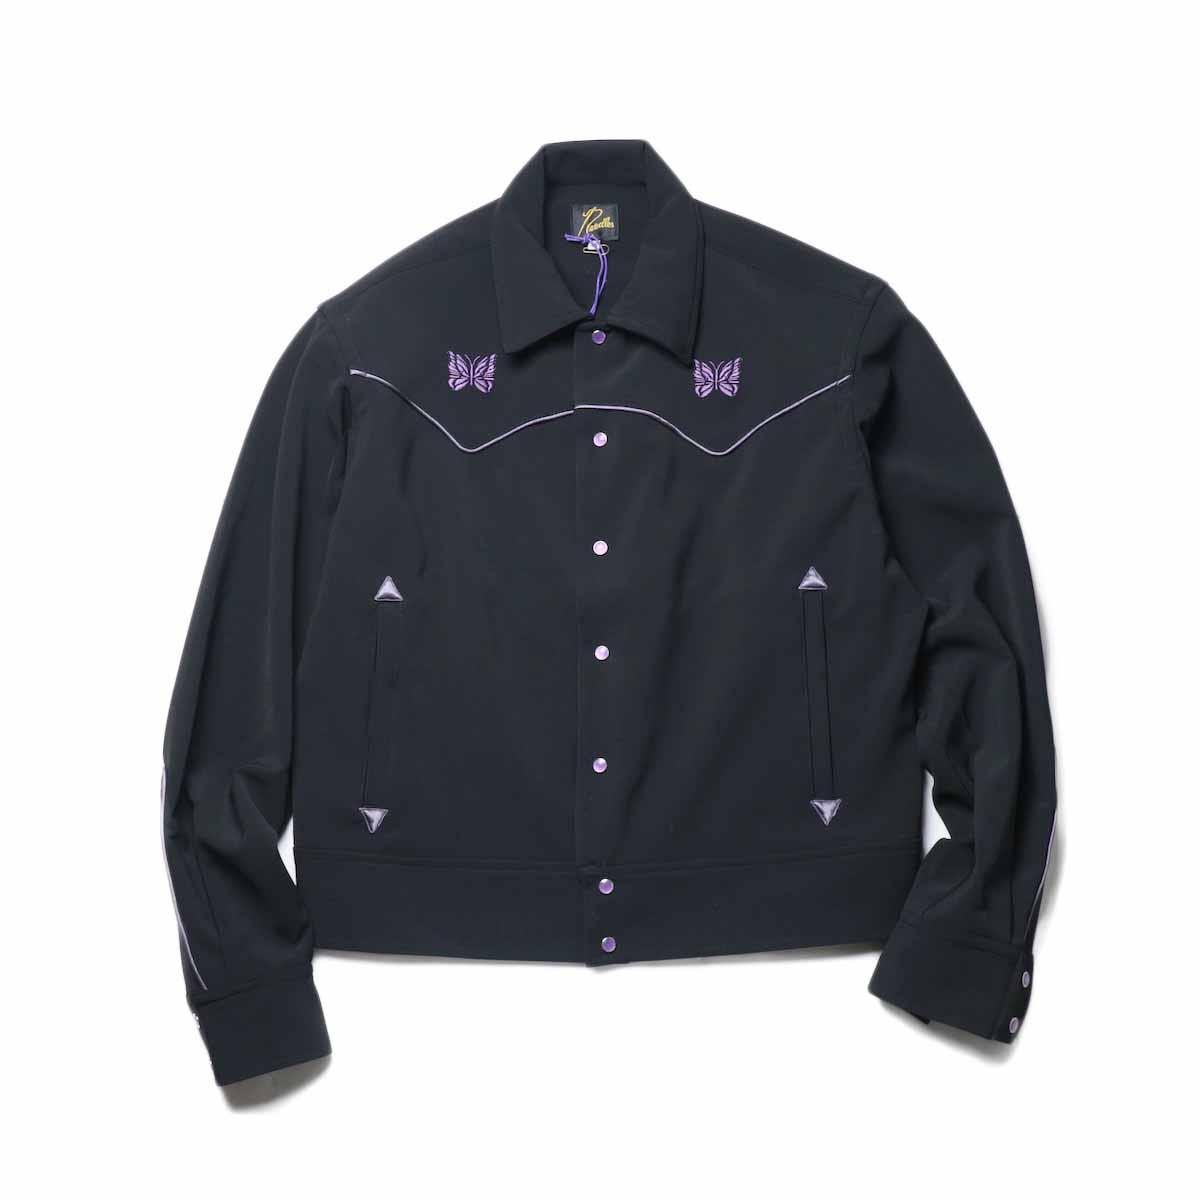 Needles / PIPING COWBOY JAC - PE/PU DOUBLE CLOTH (Black)